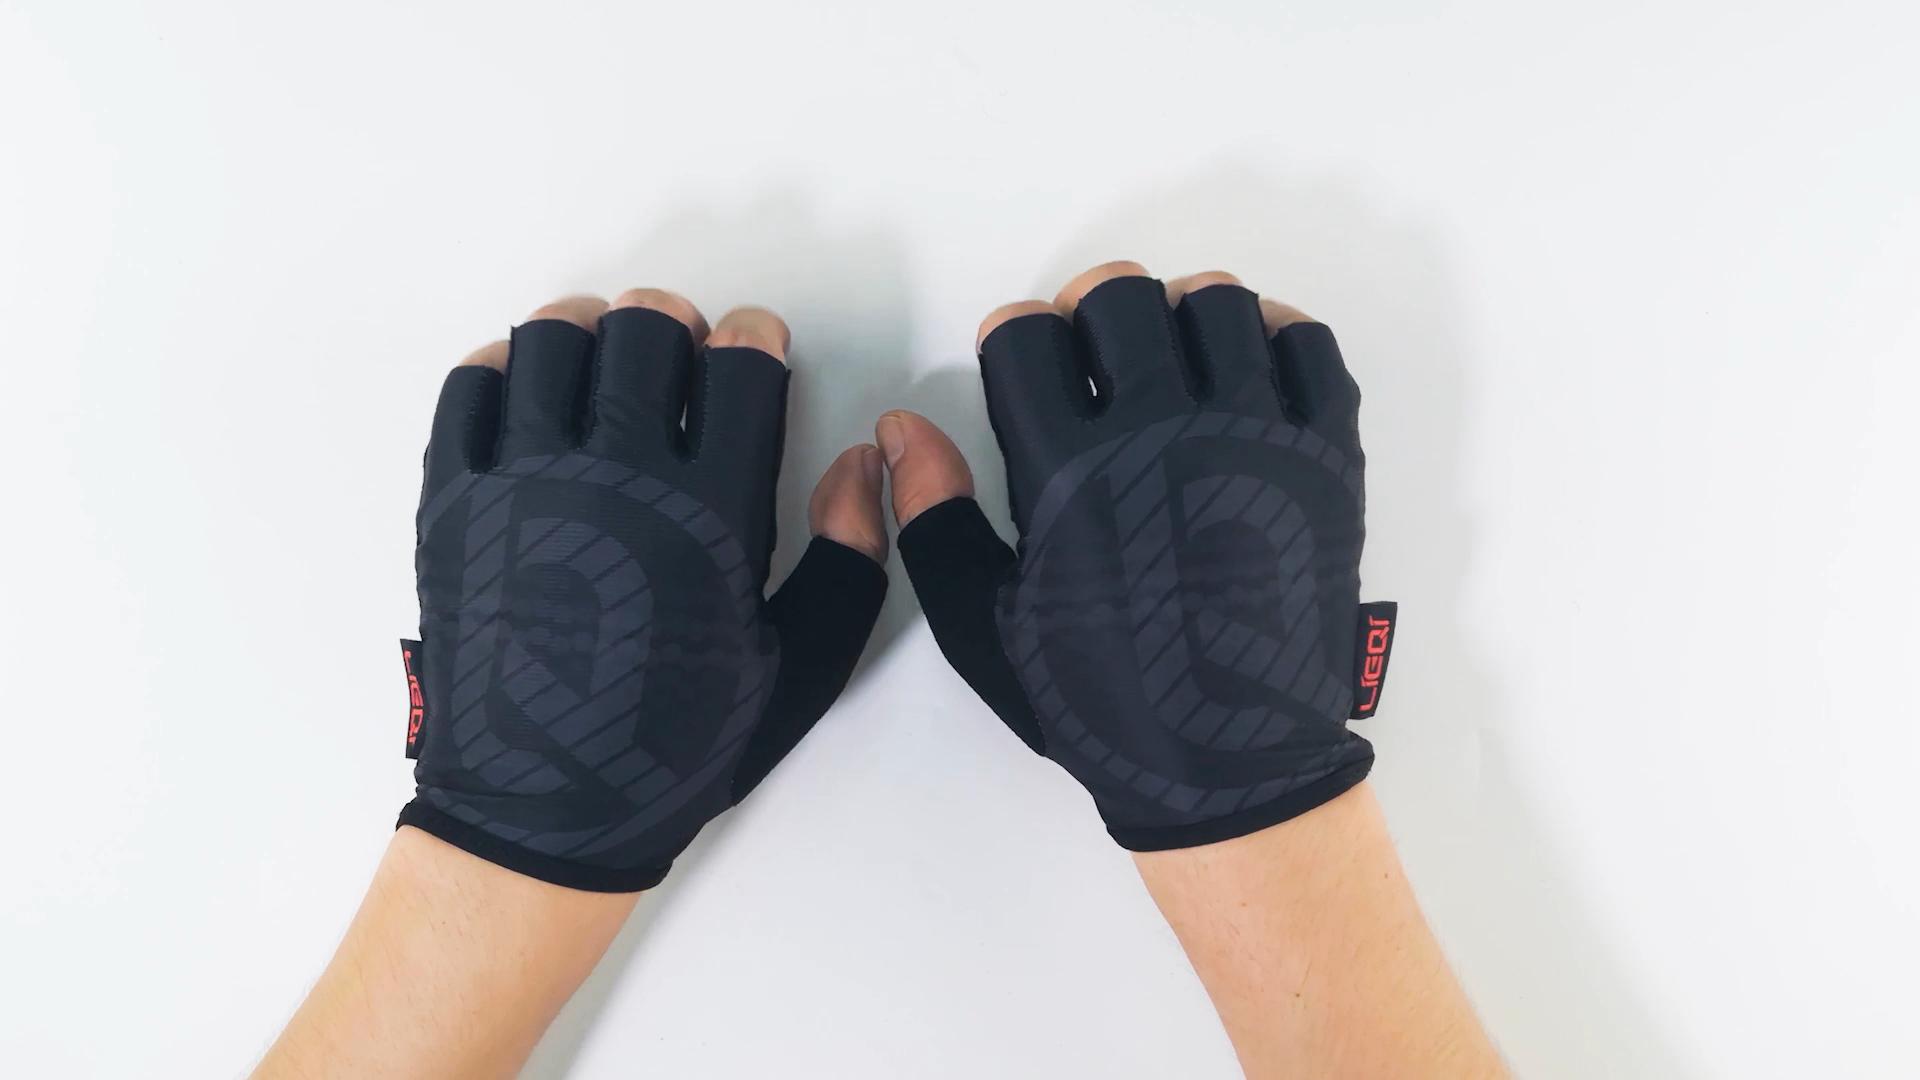 2021 high quality bike fingerless gloves cycling gel gloves for sale